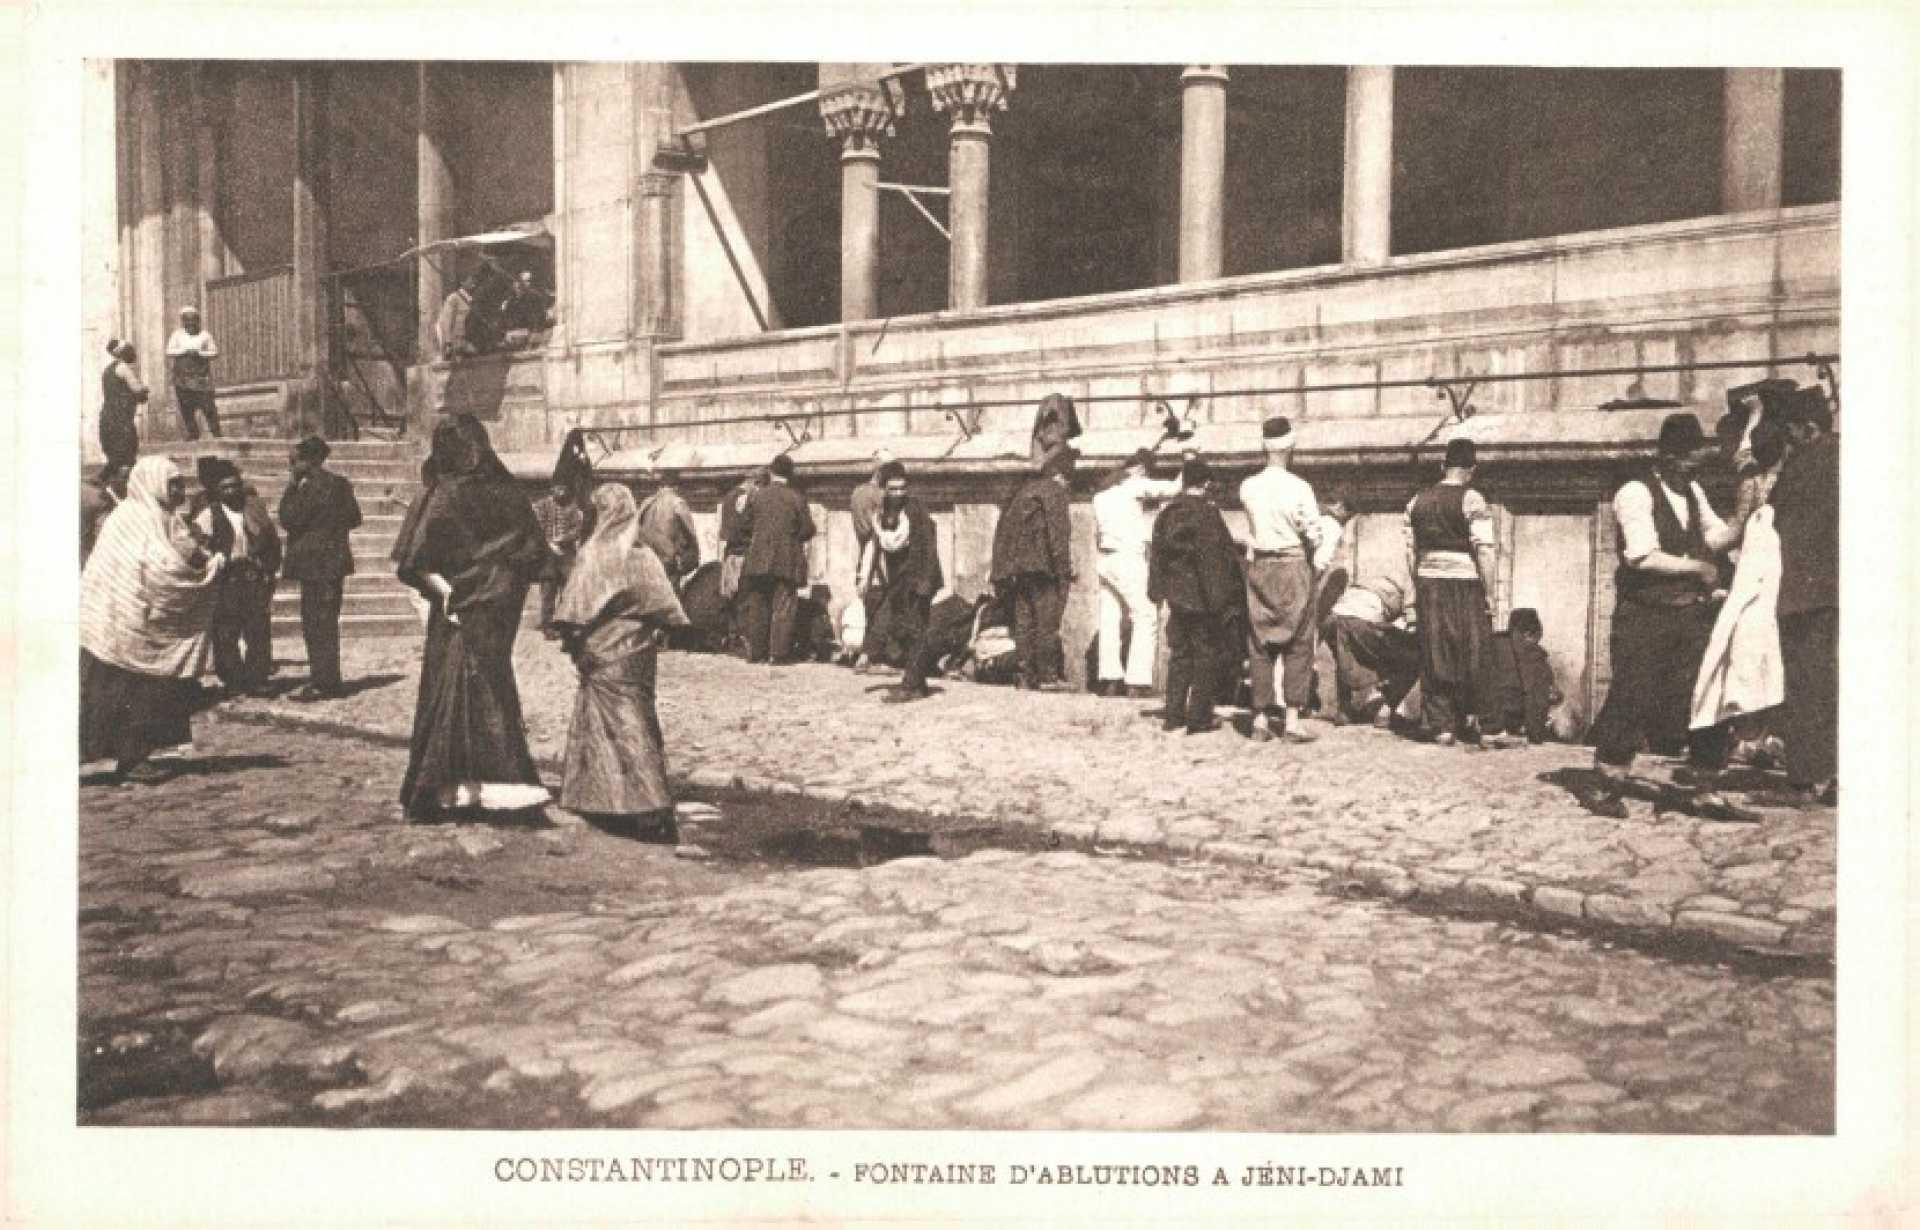 Constantinople – Fontaine D'Ablutions a Jeni-Djami